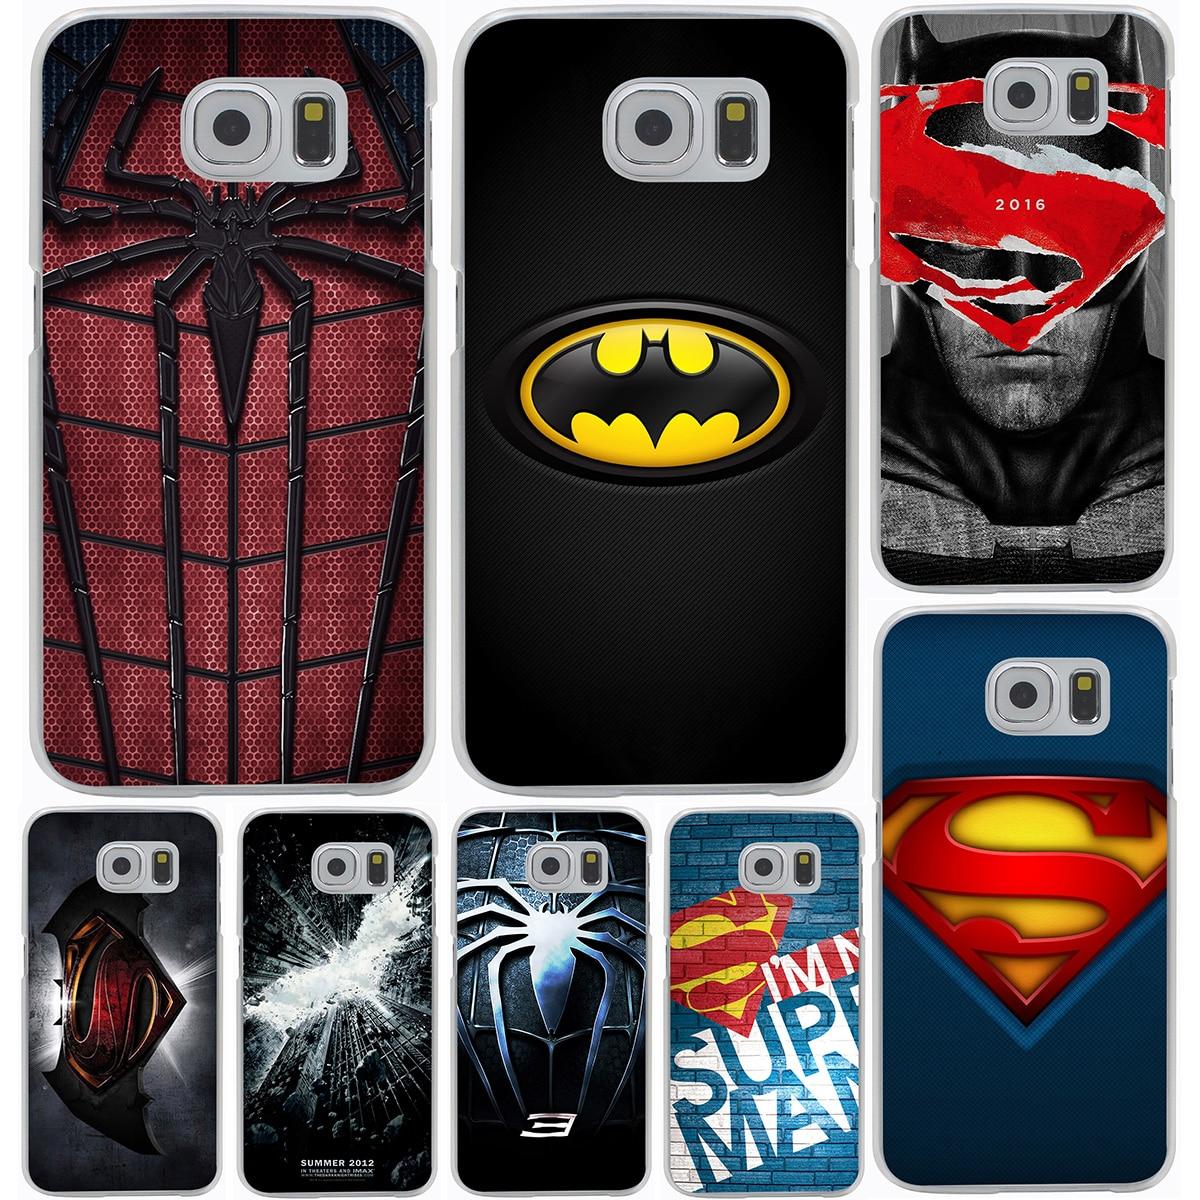 <font><b>Super</b></font> Hero <font><b>Spider</b></font> <font><b>Man</b></font> And Captain America Hard Cover <font><b>Case</b></font> for <font><b>Samsung</b></font> <font><b>Galaxy</b></font> S3 S4 S5 & Mini S6 S7 S8 Edge Plus